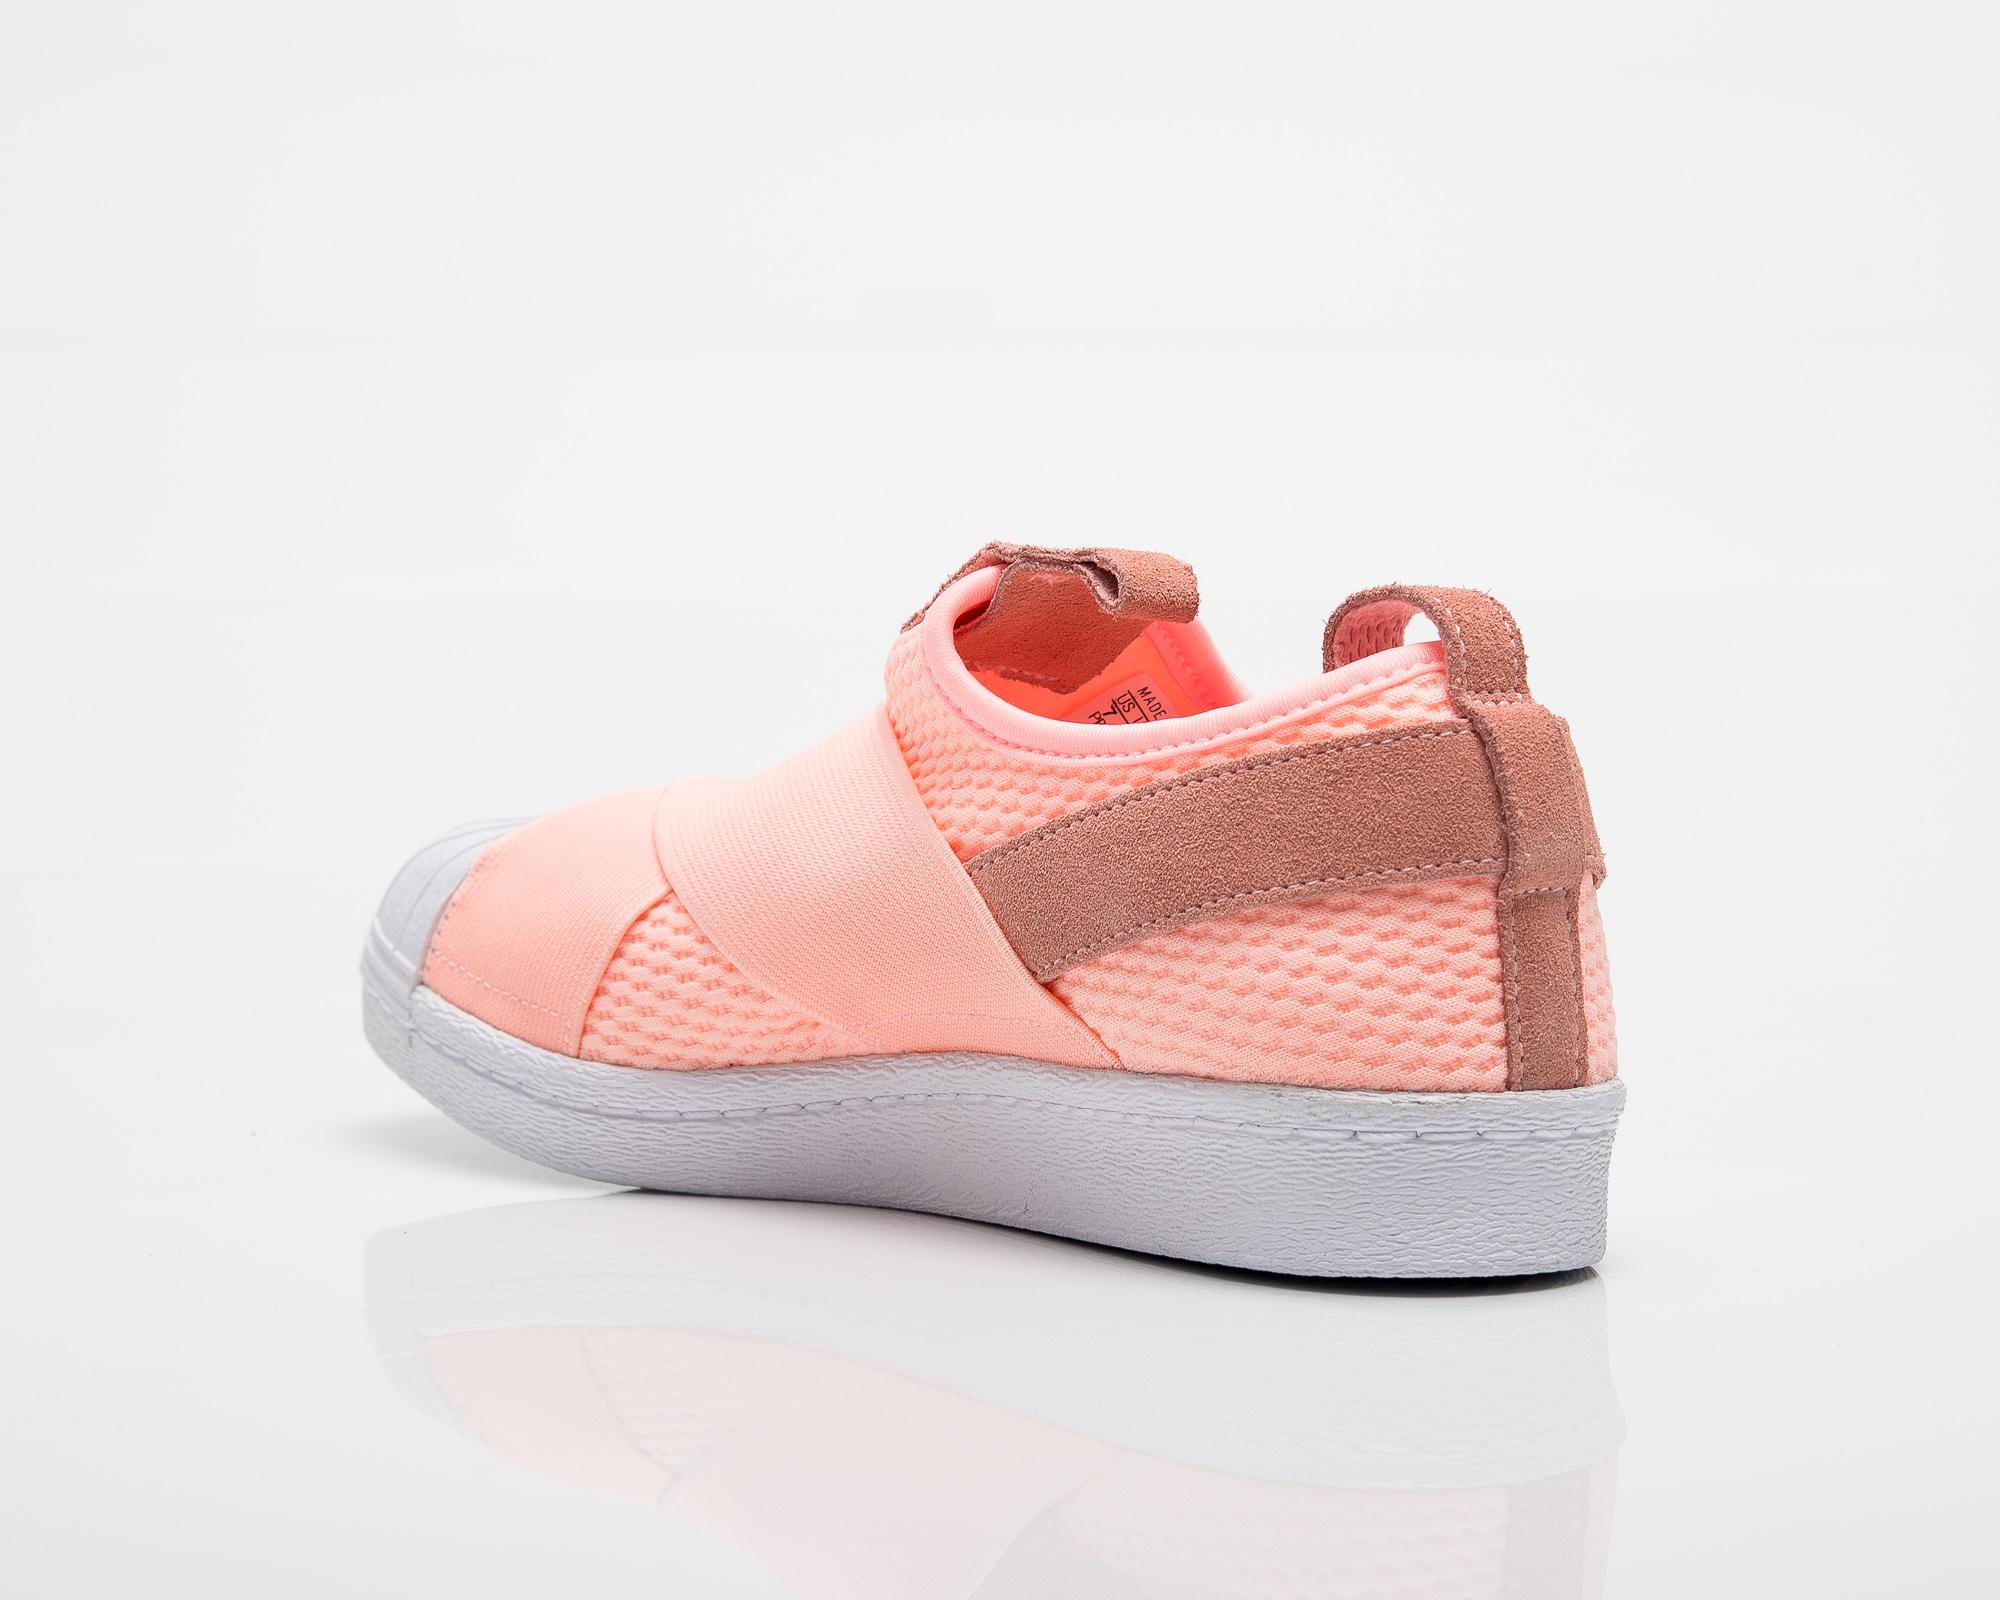 superior quality a7b43 c6698 adidas Originals Wmns Superstar Slip On - Shoes Casual ...